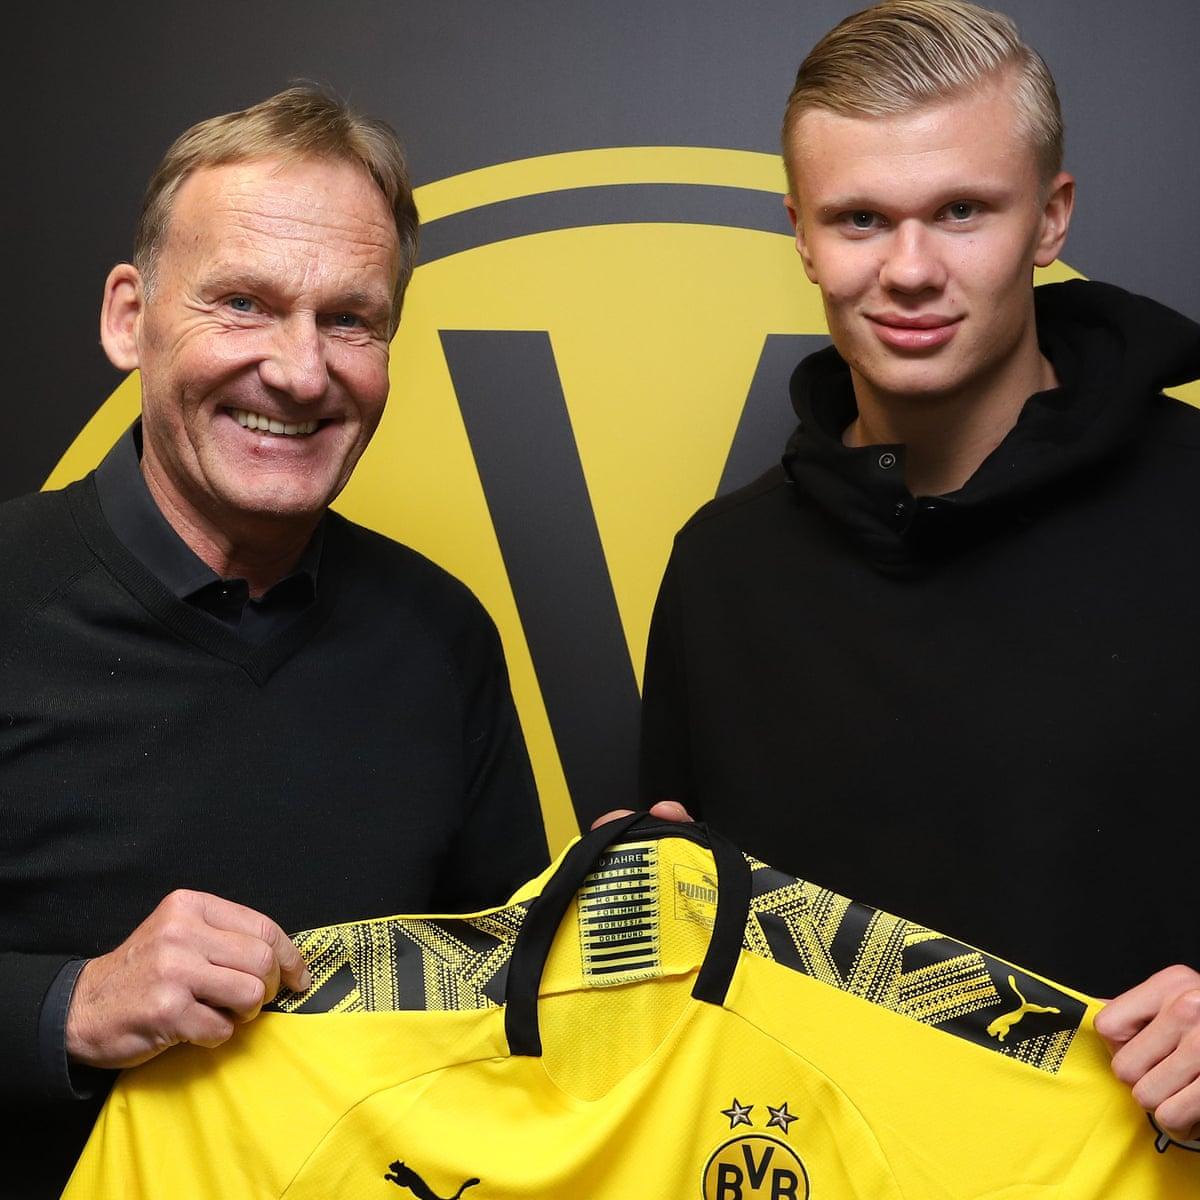 Borussia Dortmund Sign Erling Braut Haaland From Rb Salzburg For 22 5m Borussia Dortmund The Guardian